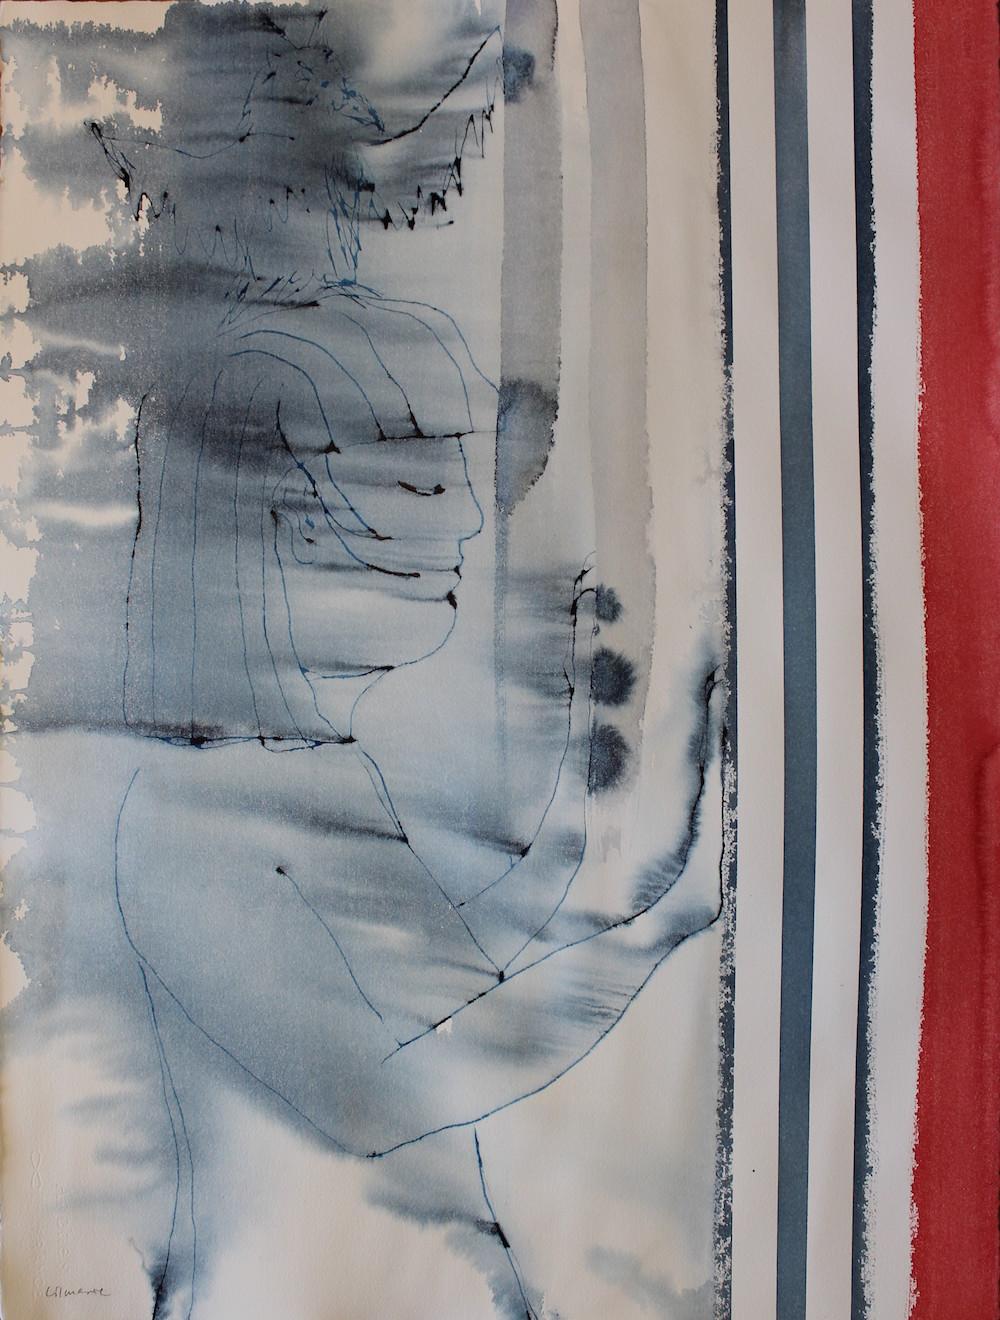 Lilmarie Mellberg Måleri |Akvarell 56 x 76 cm utan ram 3 500 kr lilmarie.se